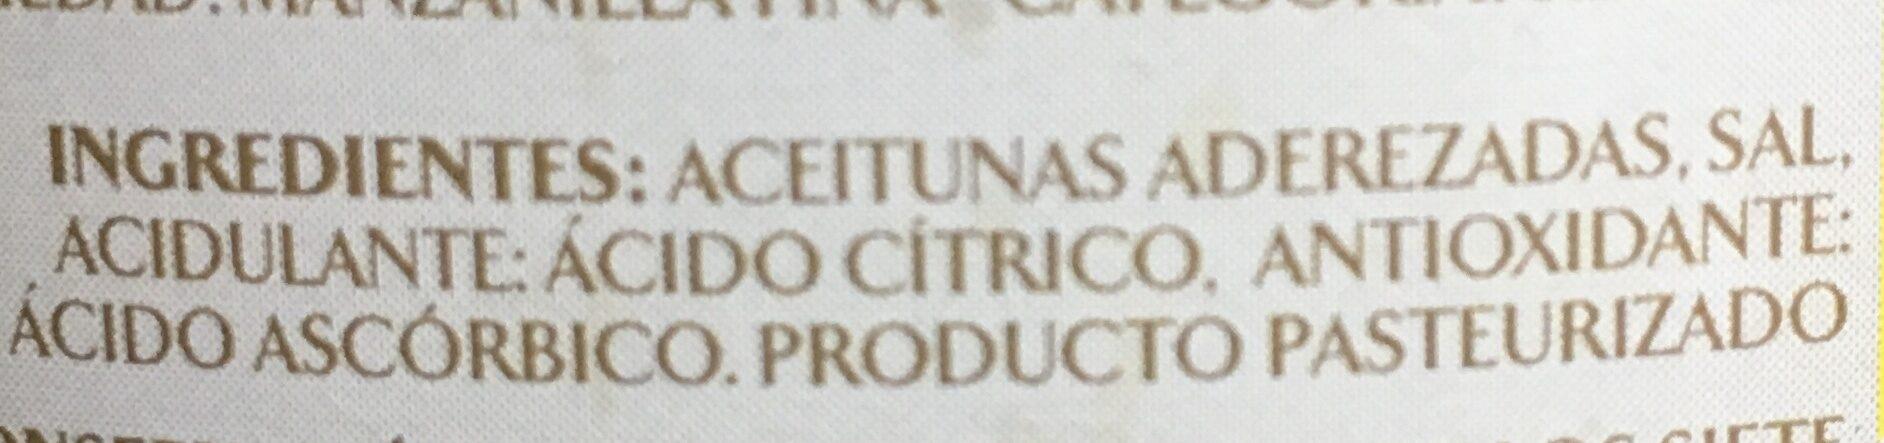 Manzanilla con hueso - Ingredients